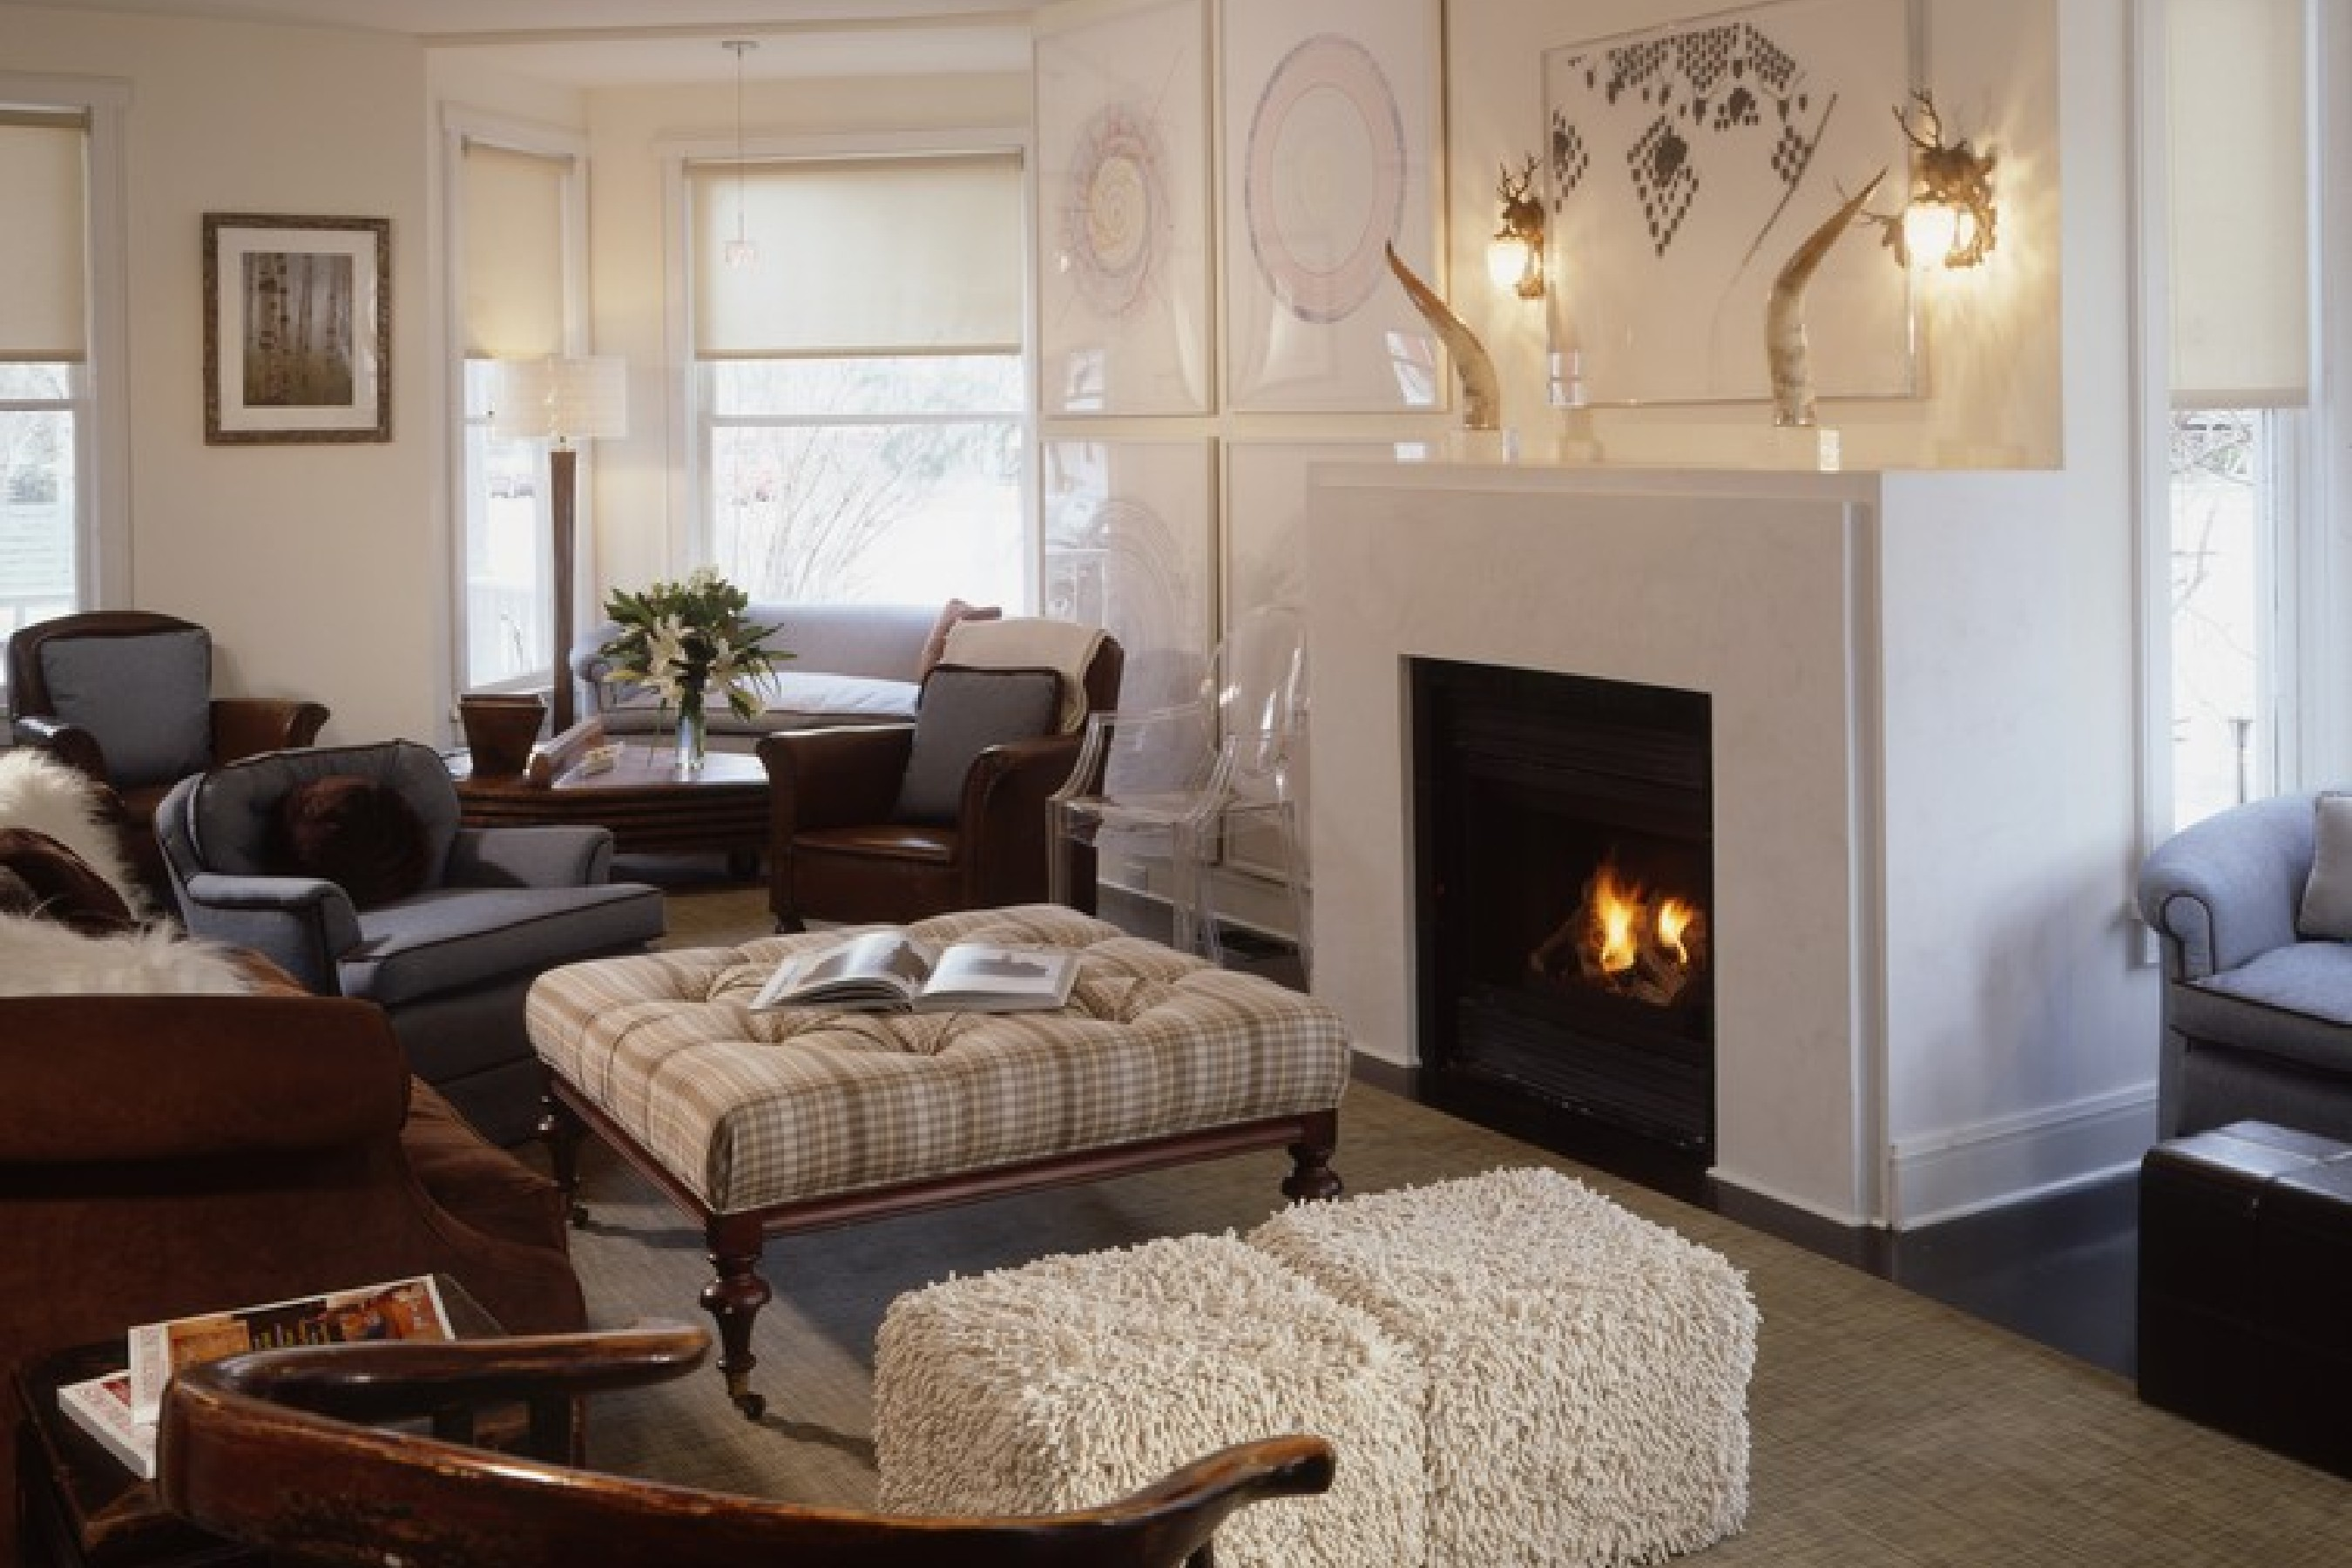 Casa Unifamiliar por un Alquiler en 135 E. Cooper Avenue Aspen, Colorado, 81611 Estados Unidos